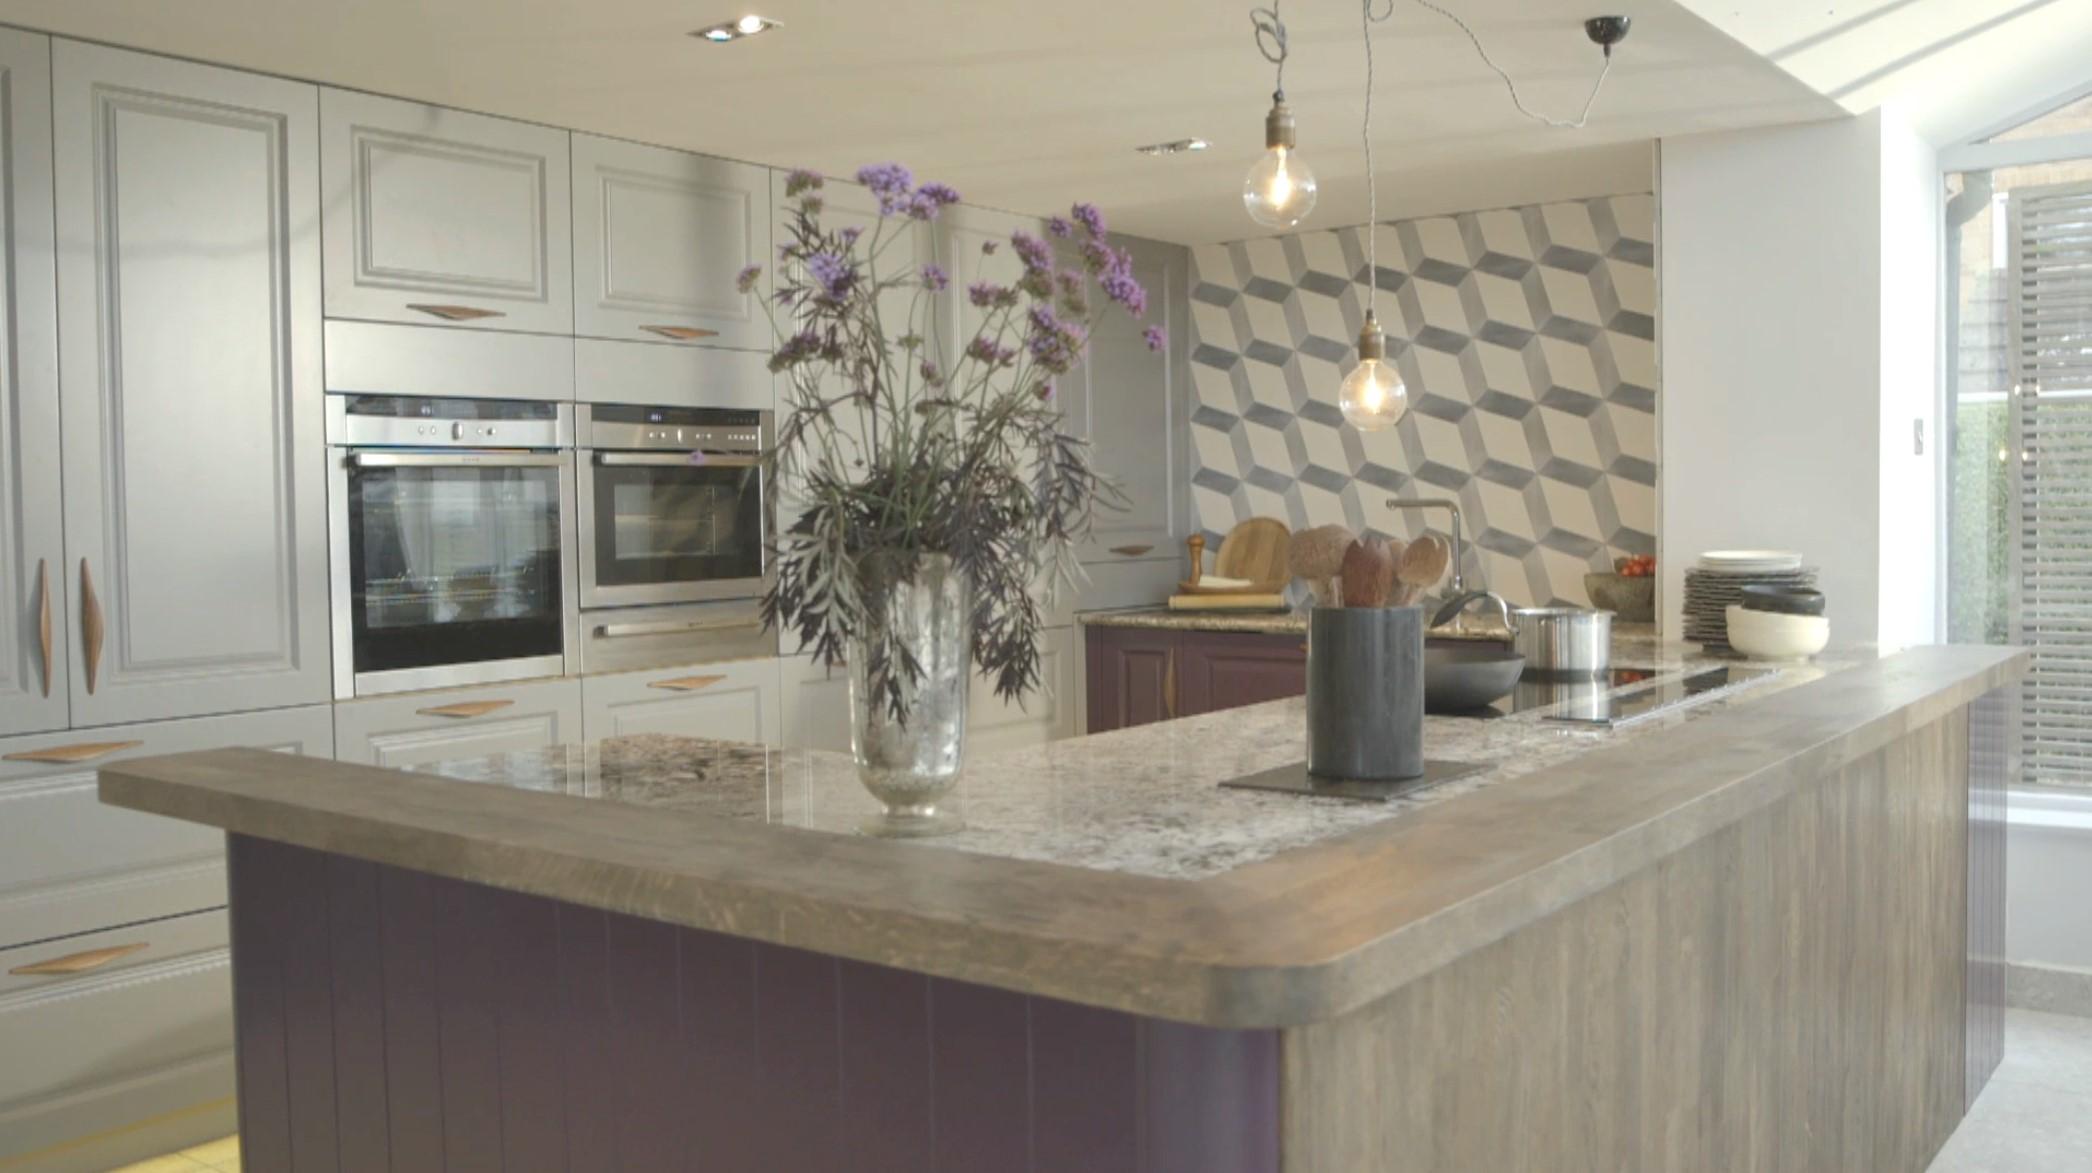 Great Linda Barker's new Wren kitchen 2092 x 1173 · 273 kB · jpeg